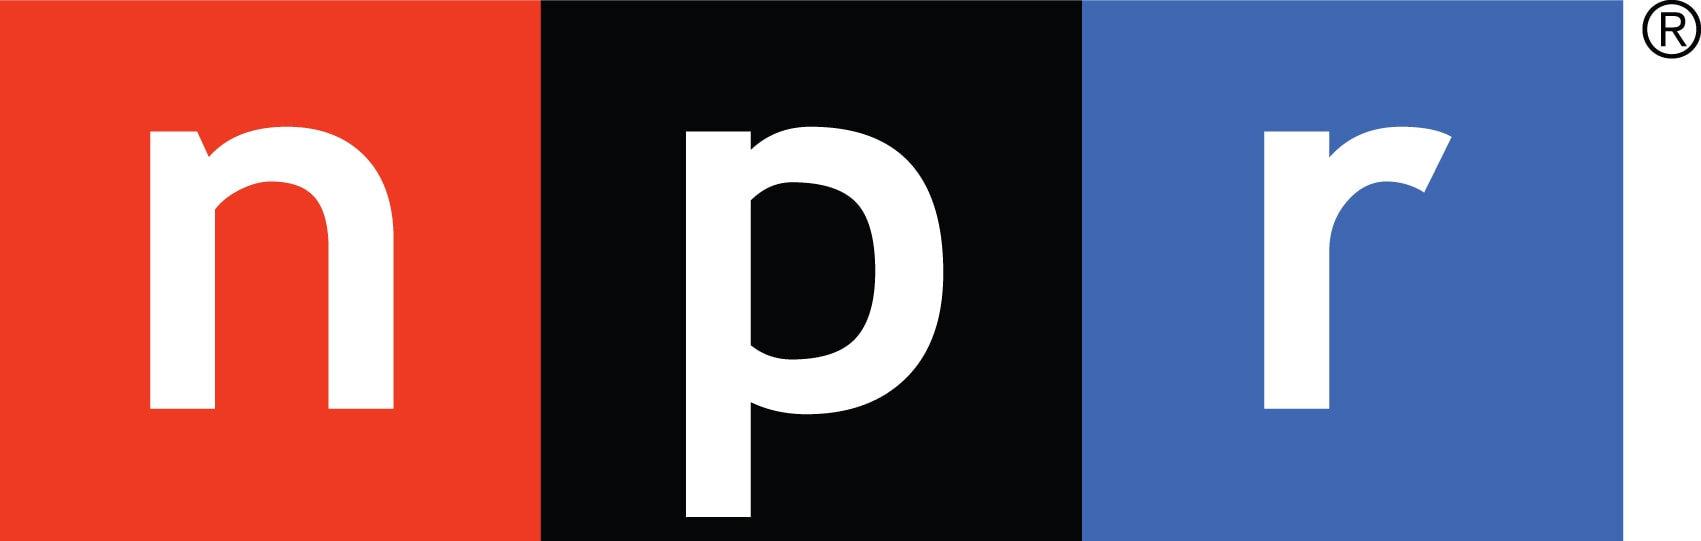 npr-logo-rgb_orig.jpg